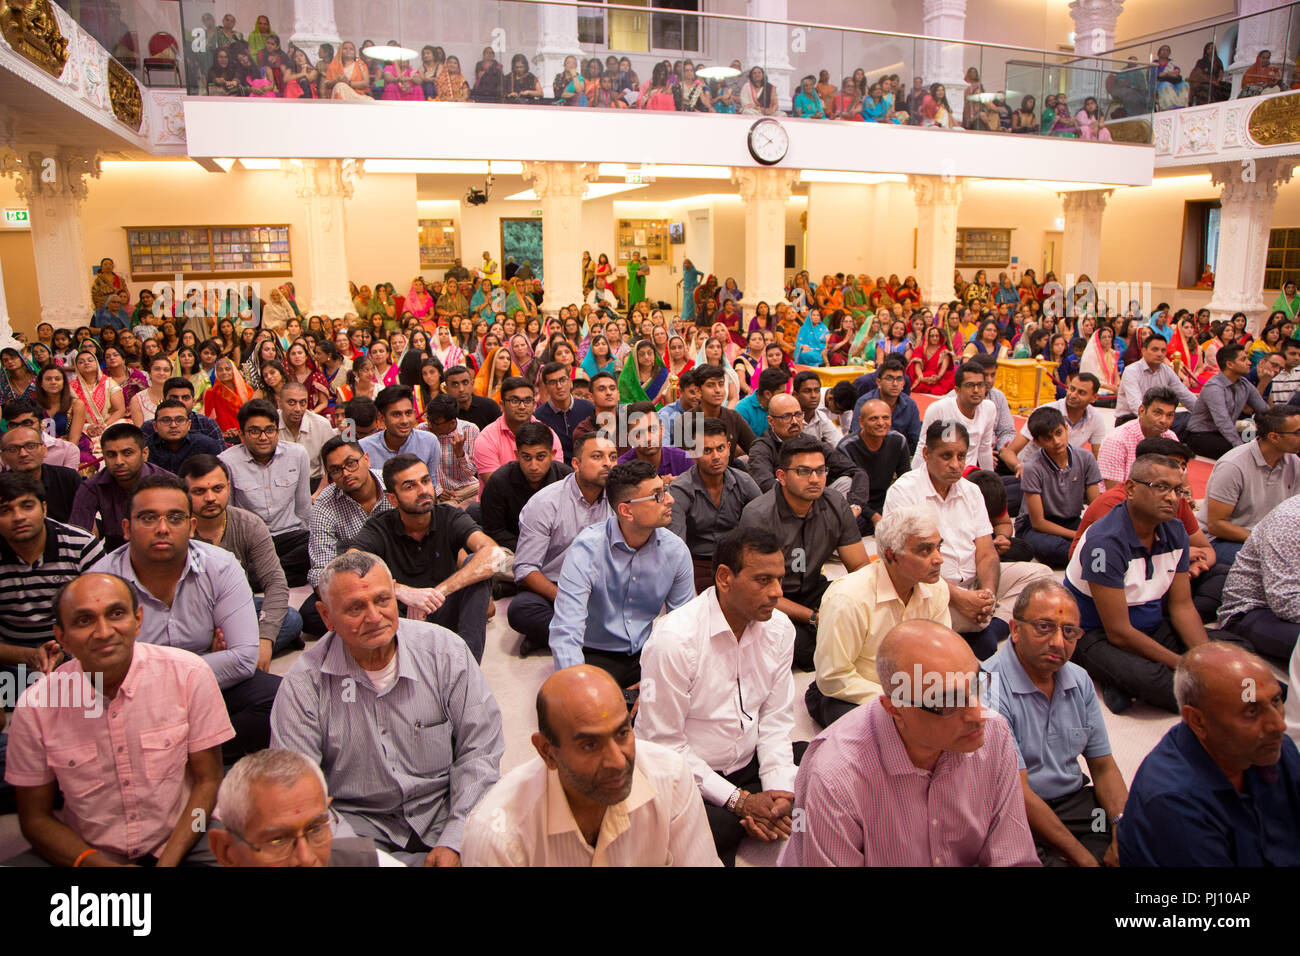 Worshippers at a Hindu temple in Kingsbury, North West London Shree Swaminarayan Mandir - Stock Image